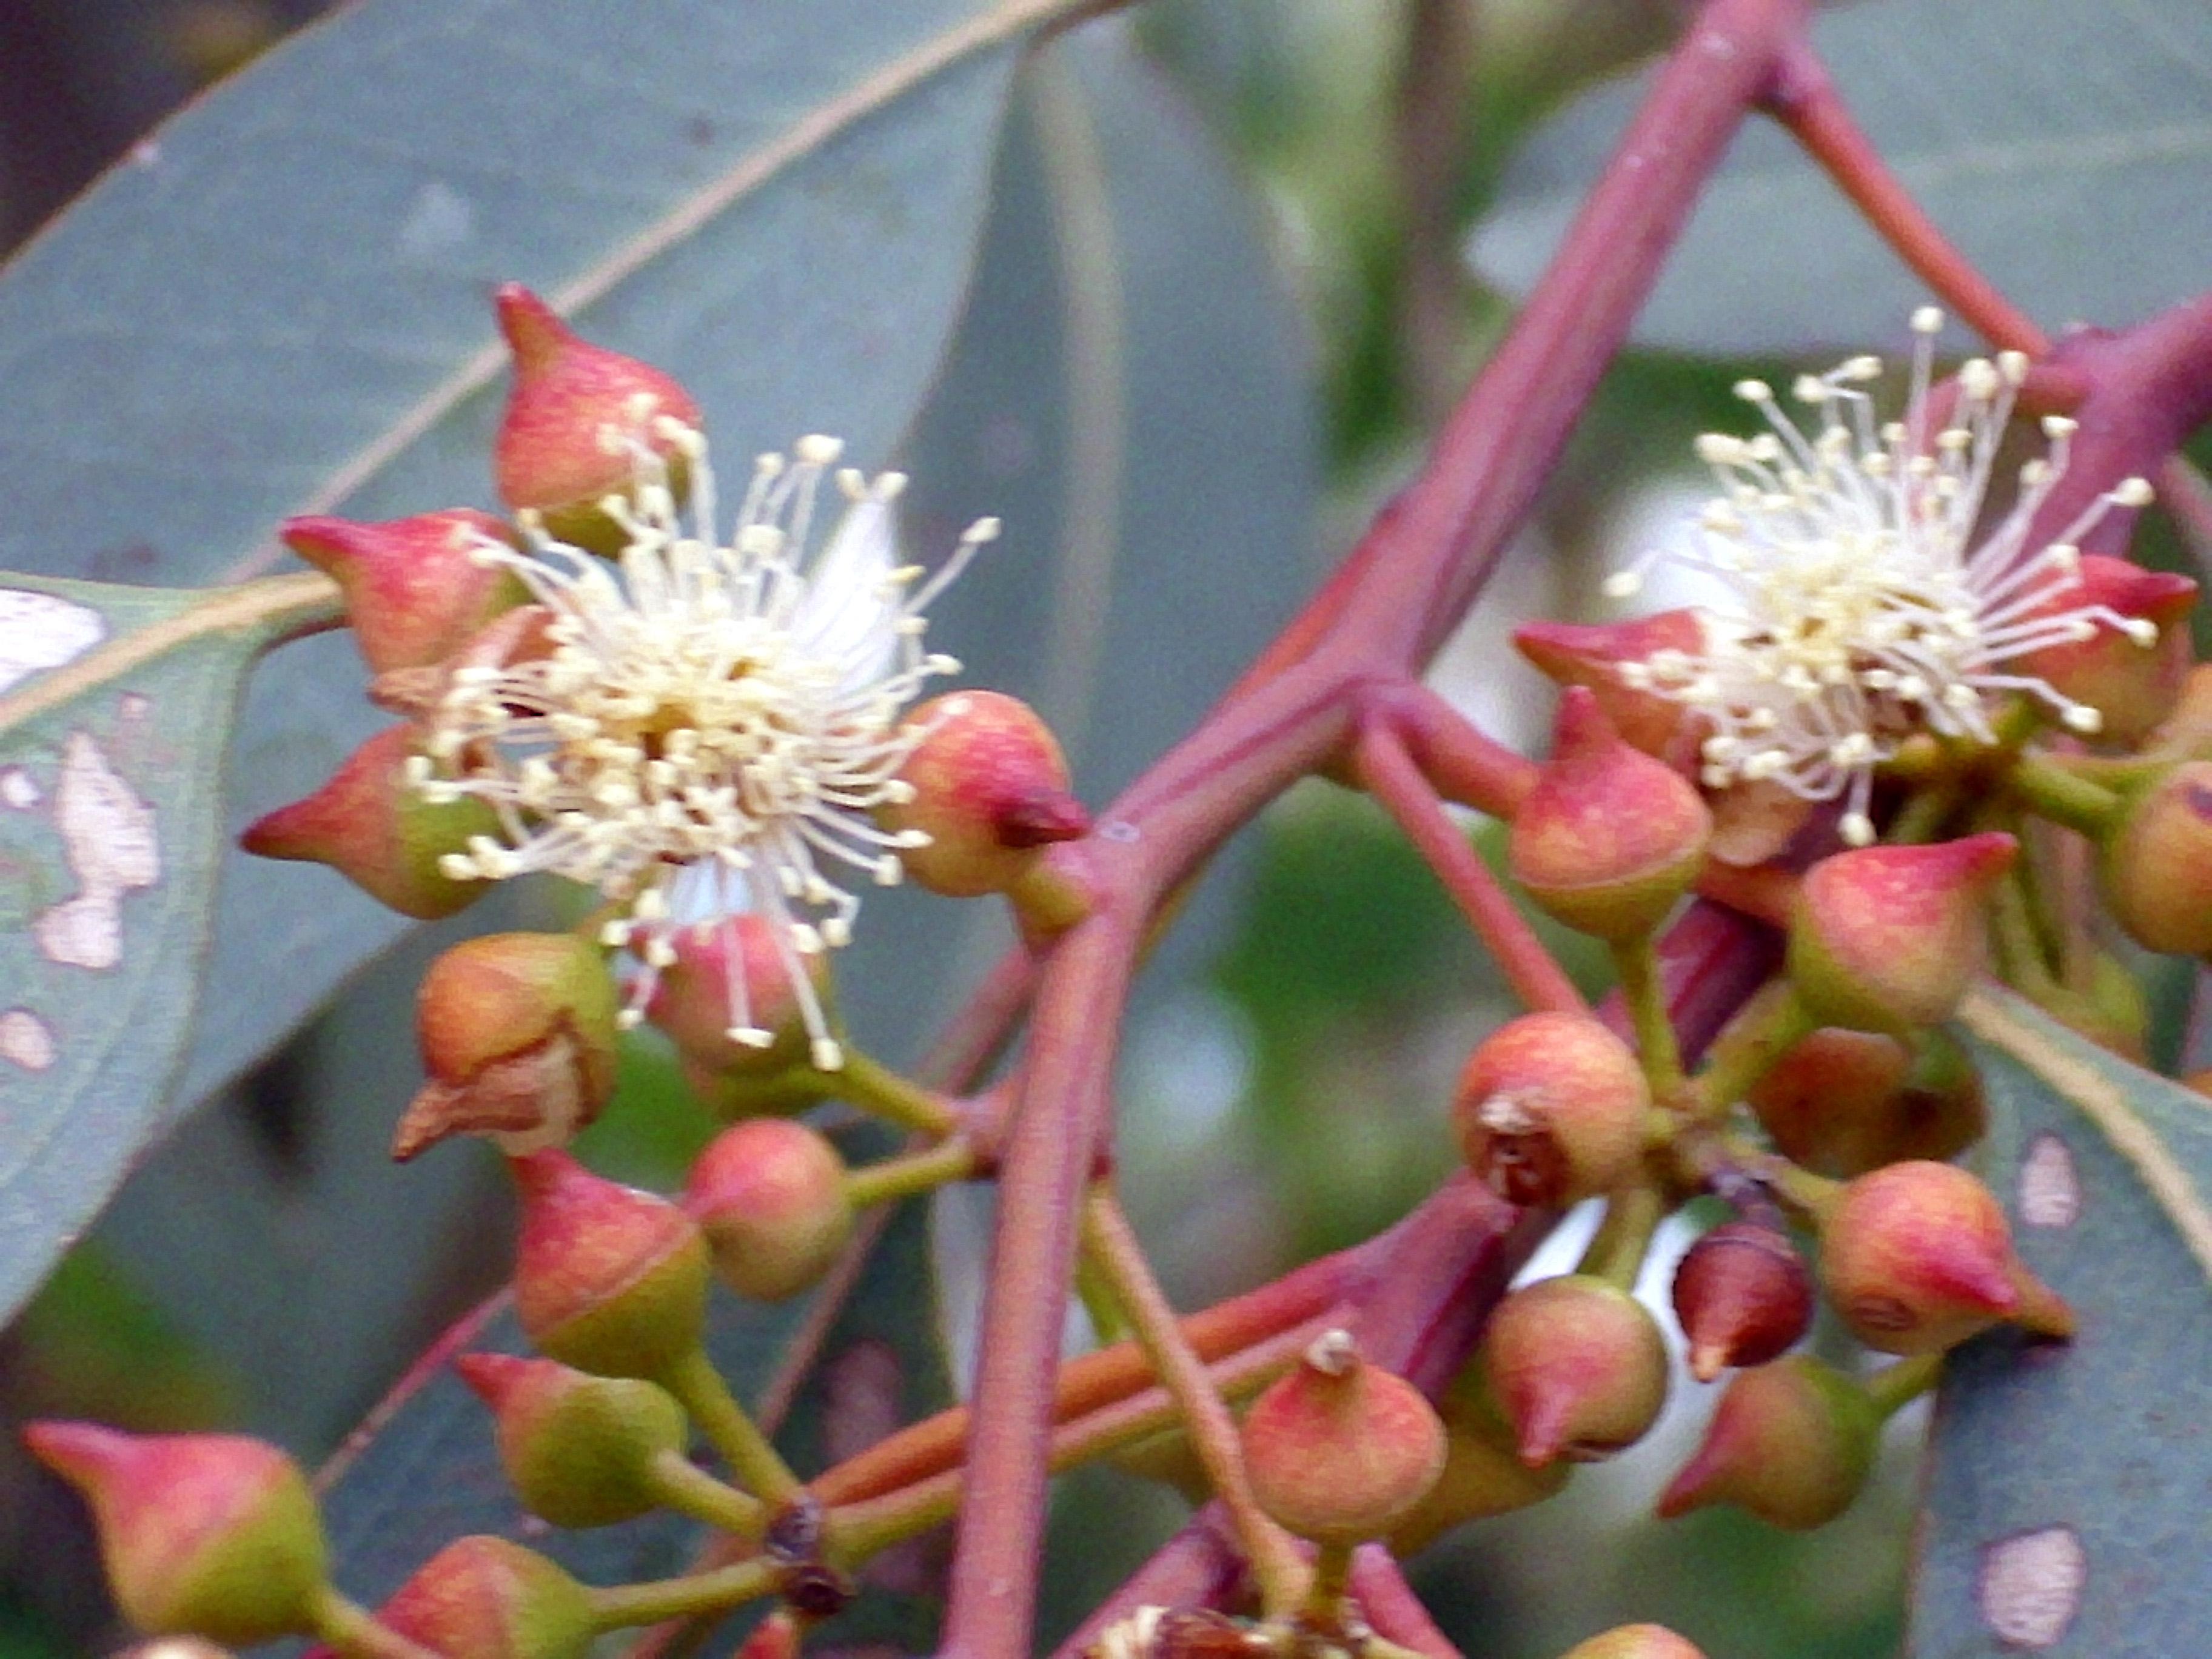 File:Eucalyptus Camaldulensis CapsulasFlorales 2010-6-17